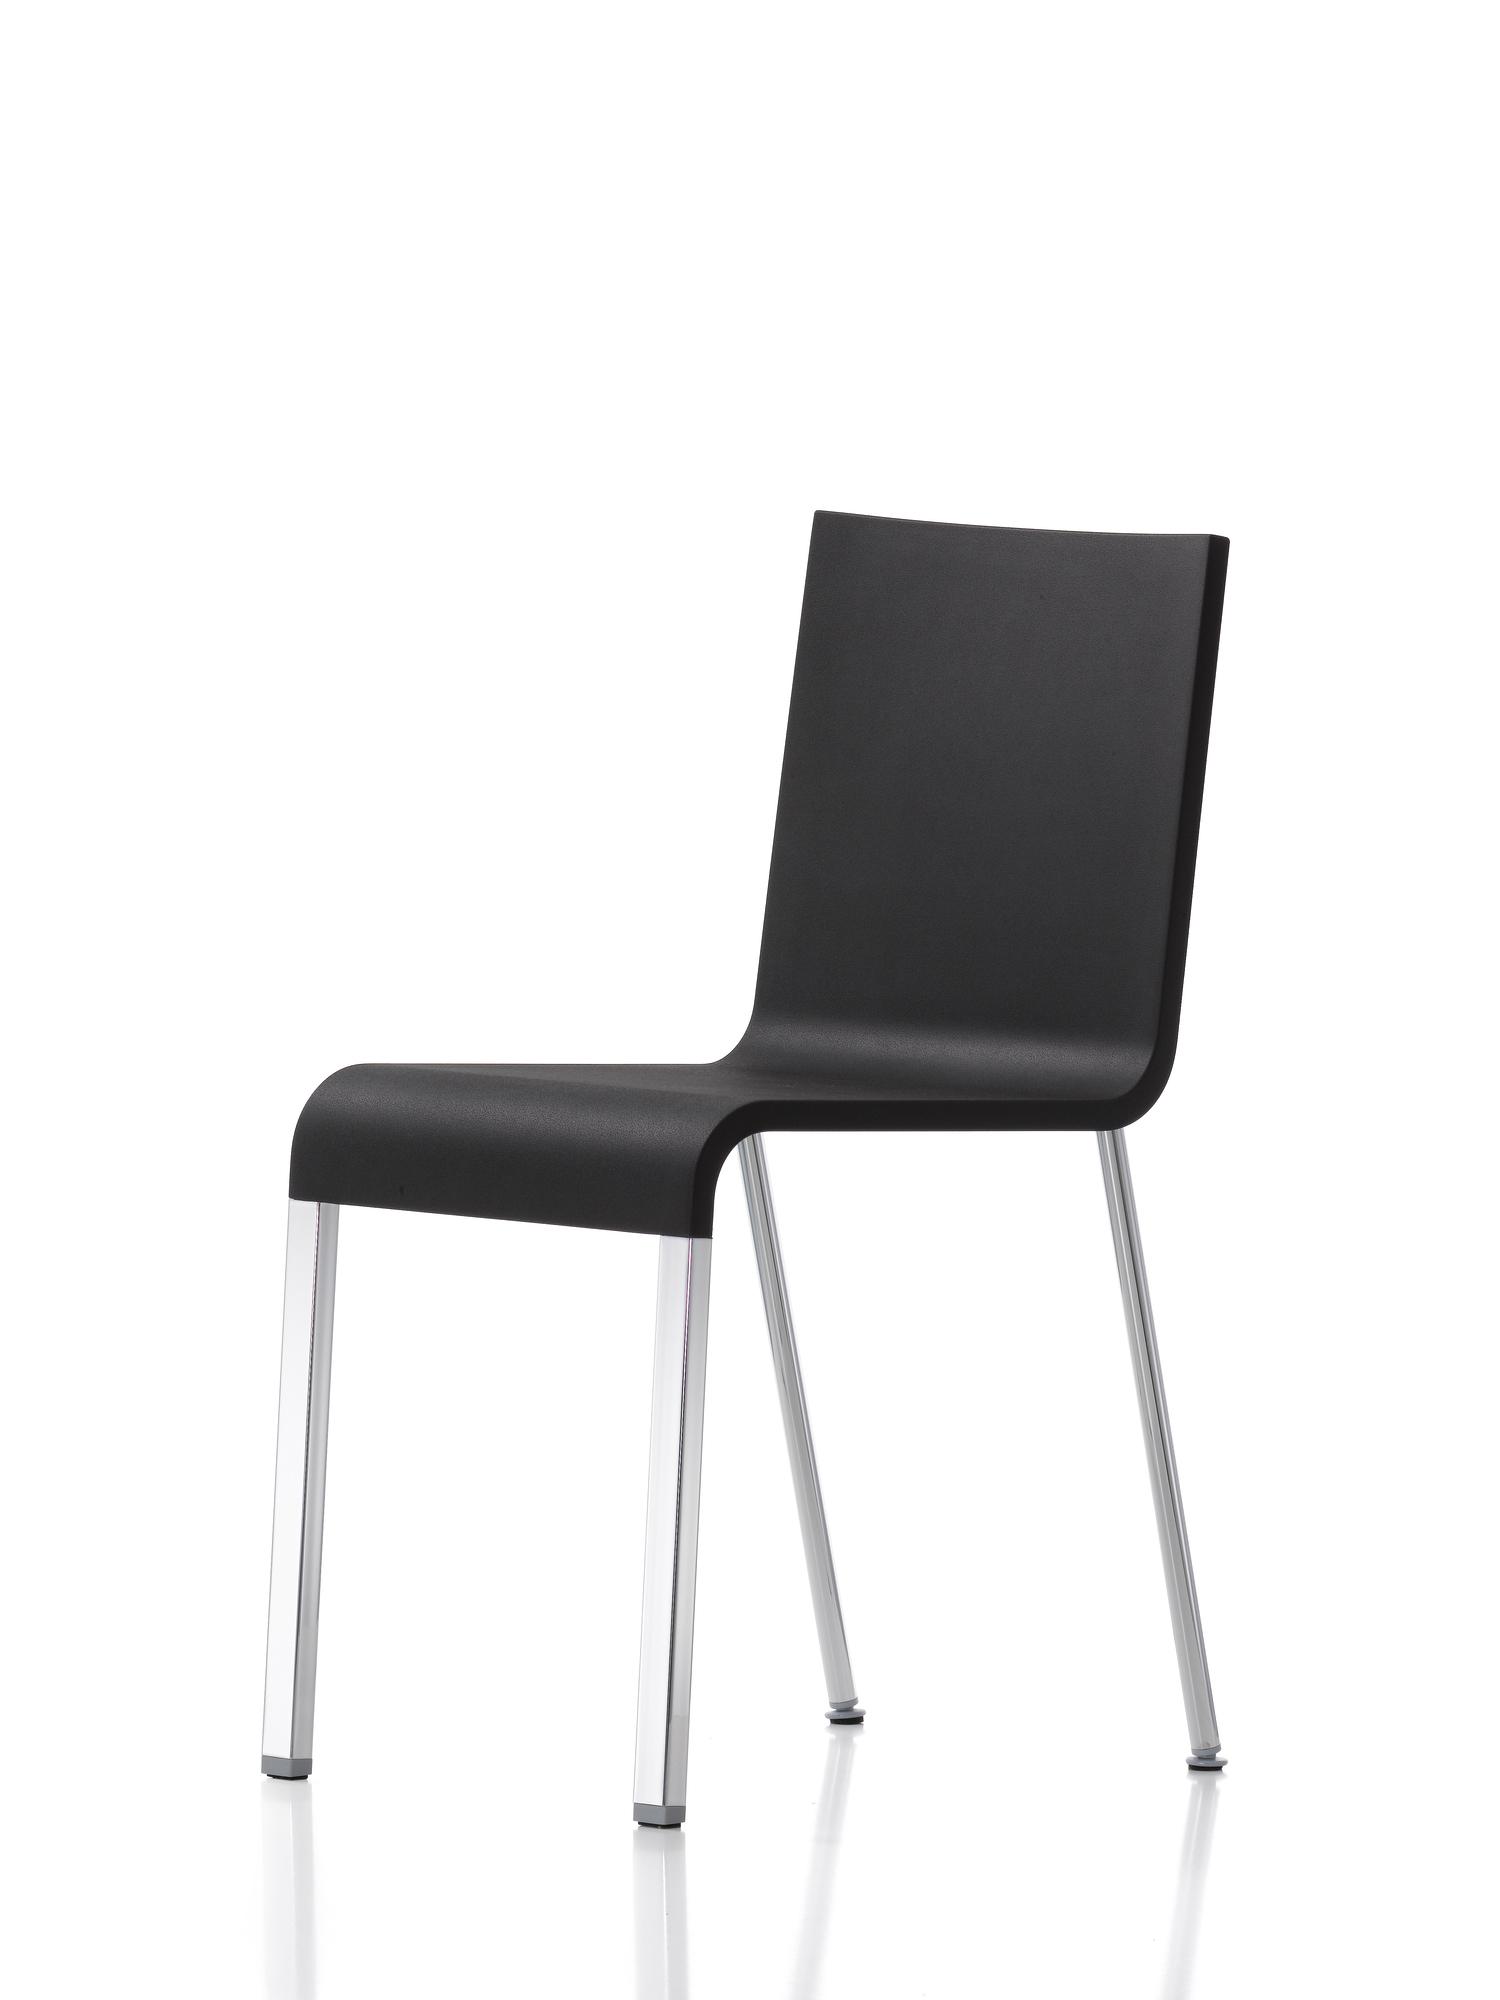 .03 Chair Vitra Quick Ship